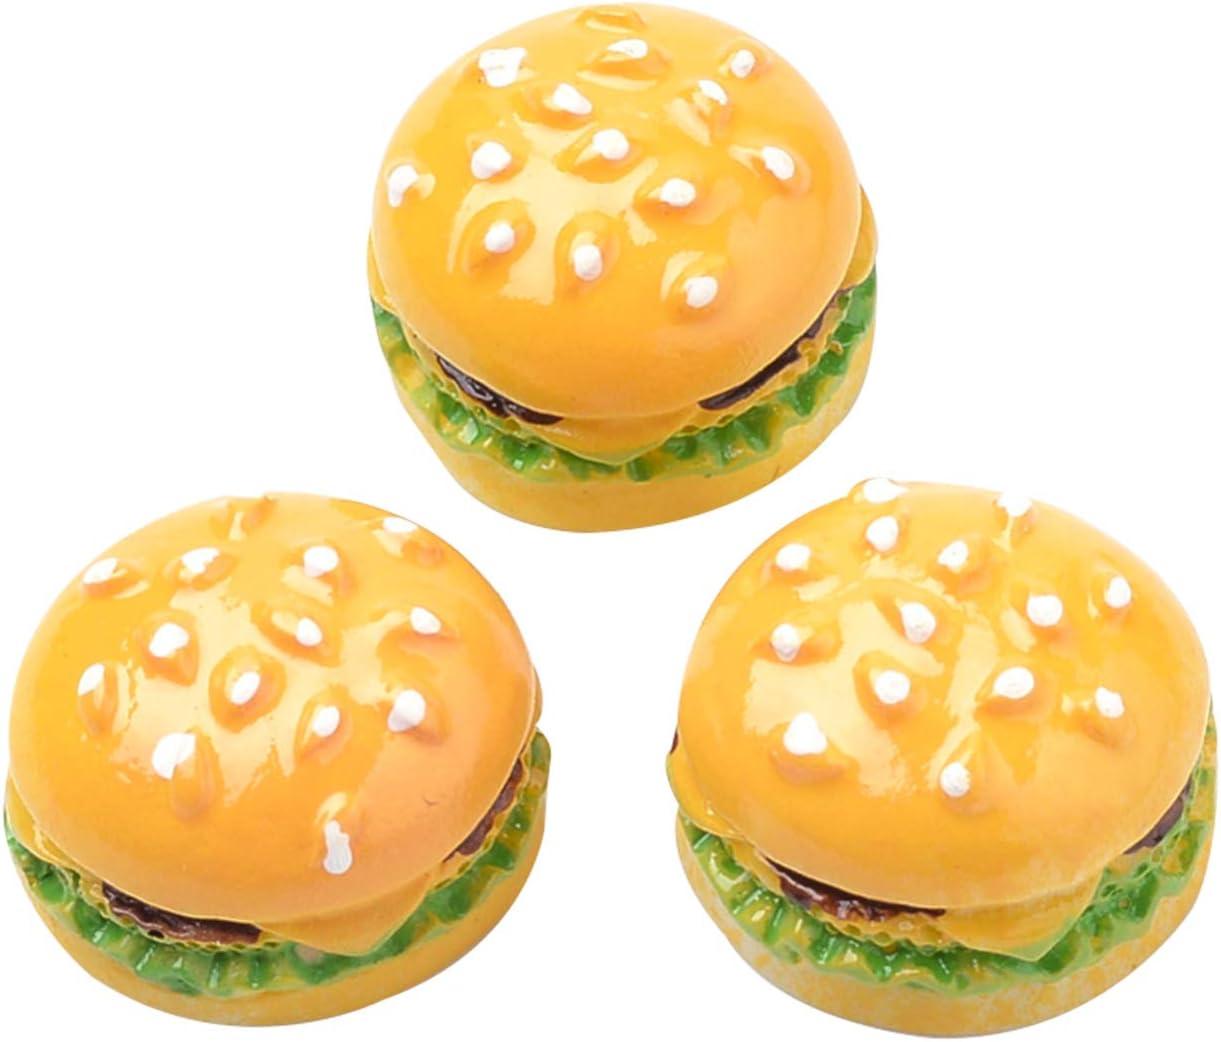 Airssory 10 Pcs Resin Flatback Slime Charm Cabochons Simulation Creative Cute Artificial Fake Bread Hamburger Miniature Mini Food Miniature Models DIY Dollhouse Accessories Party Favors - 16~17mm